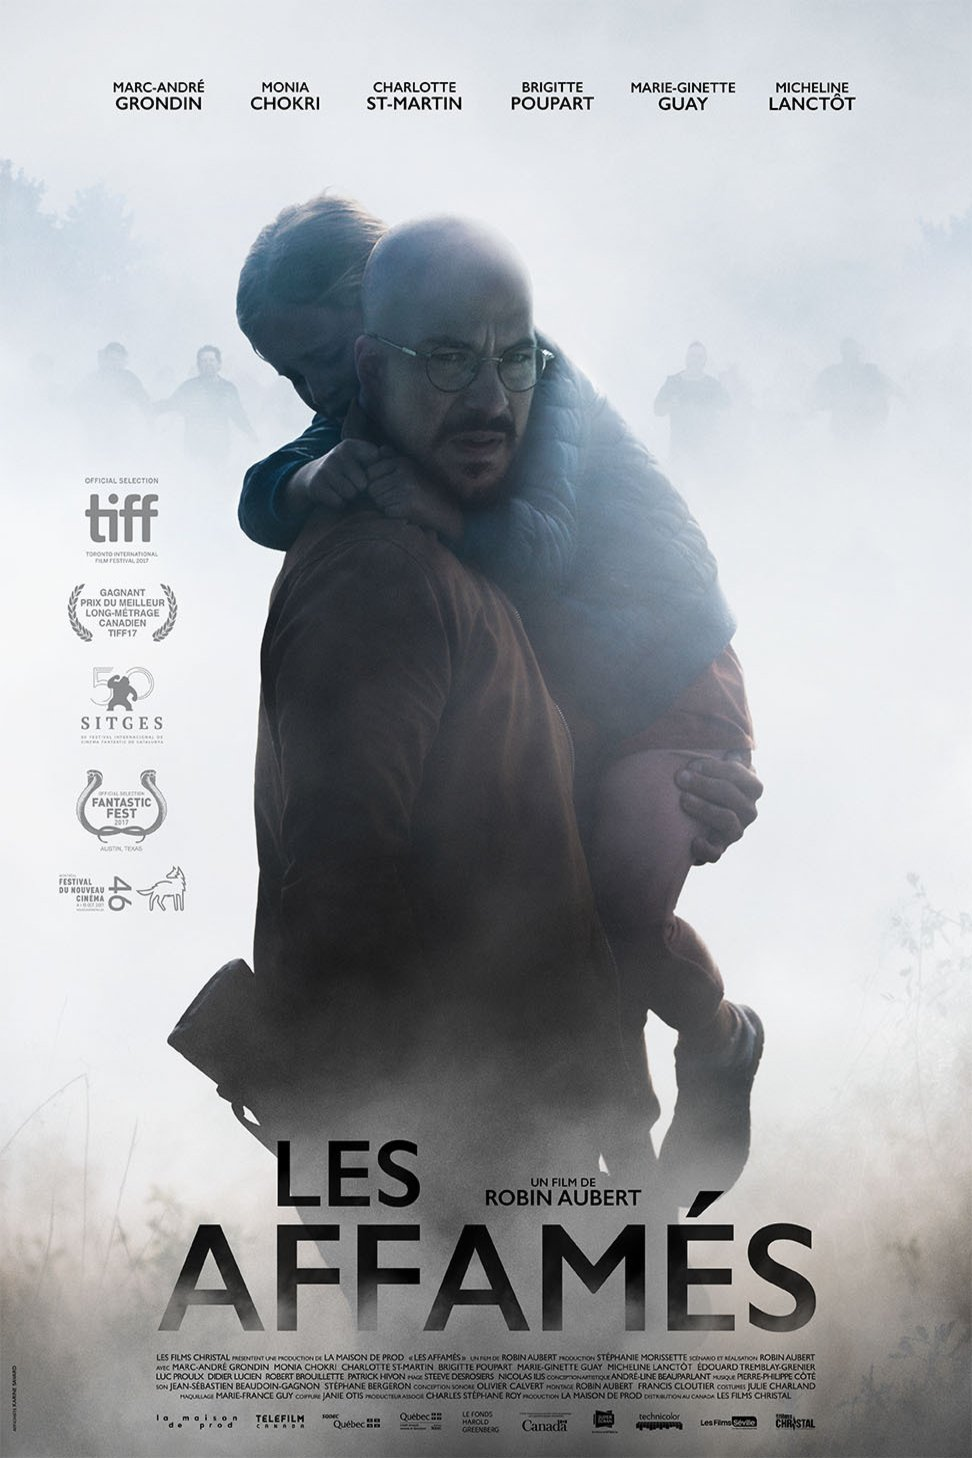 IŠTROŠKĘ (2017) / Les affamés